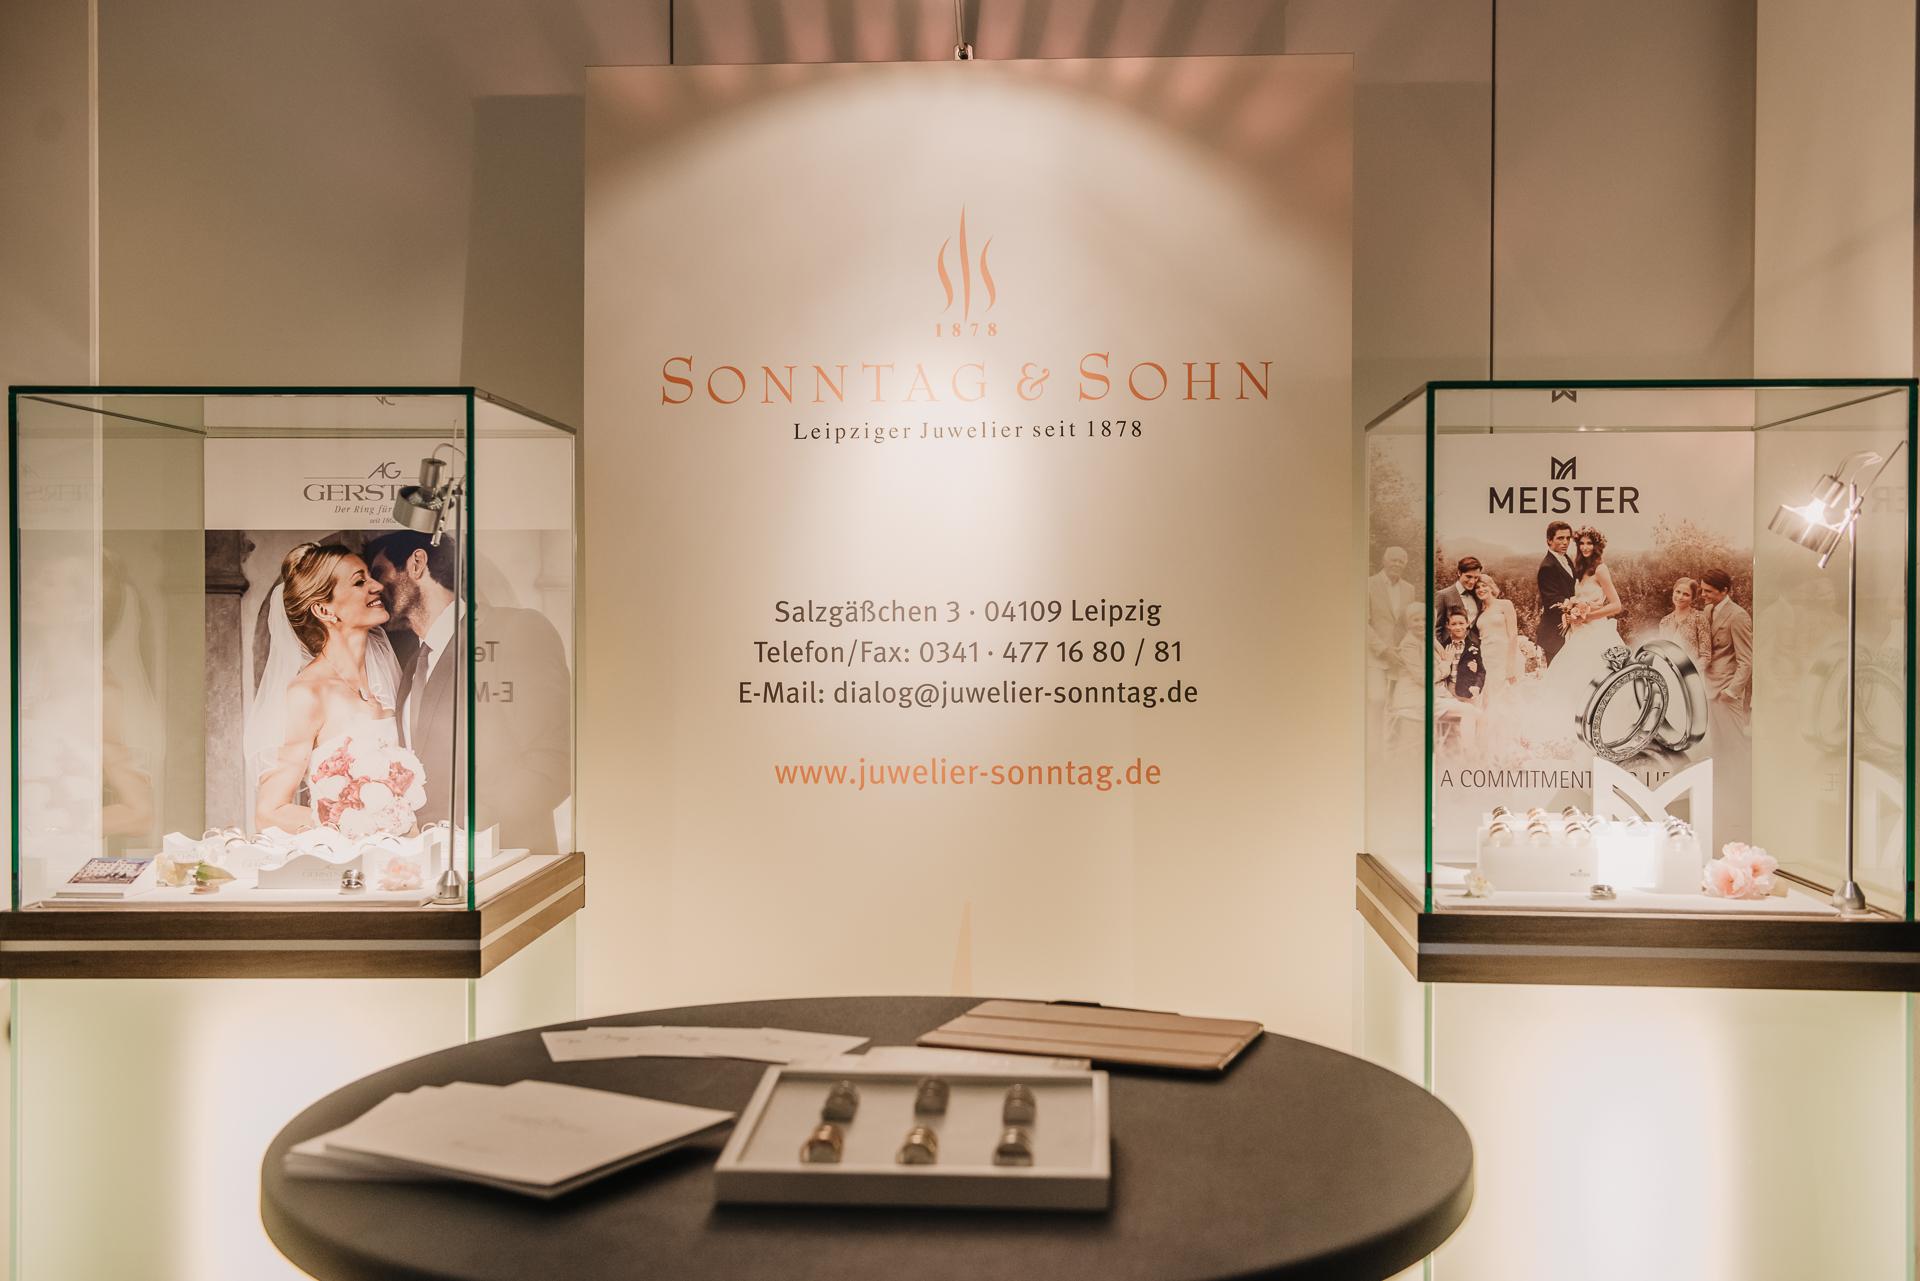 Zweinander-LeonoreHerzog-WeddingMarket-OnTour20191110-9668